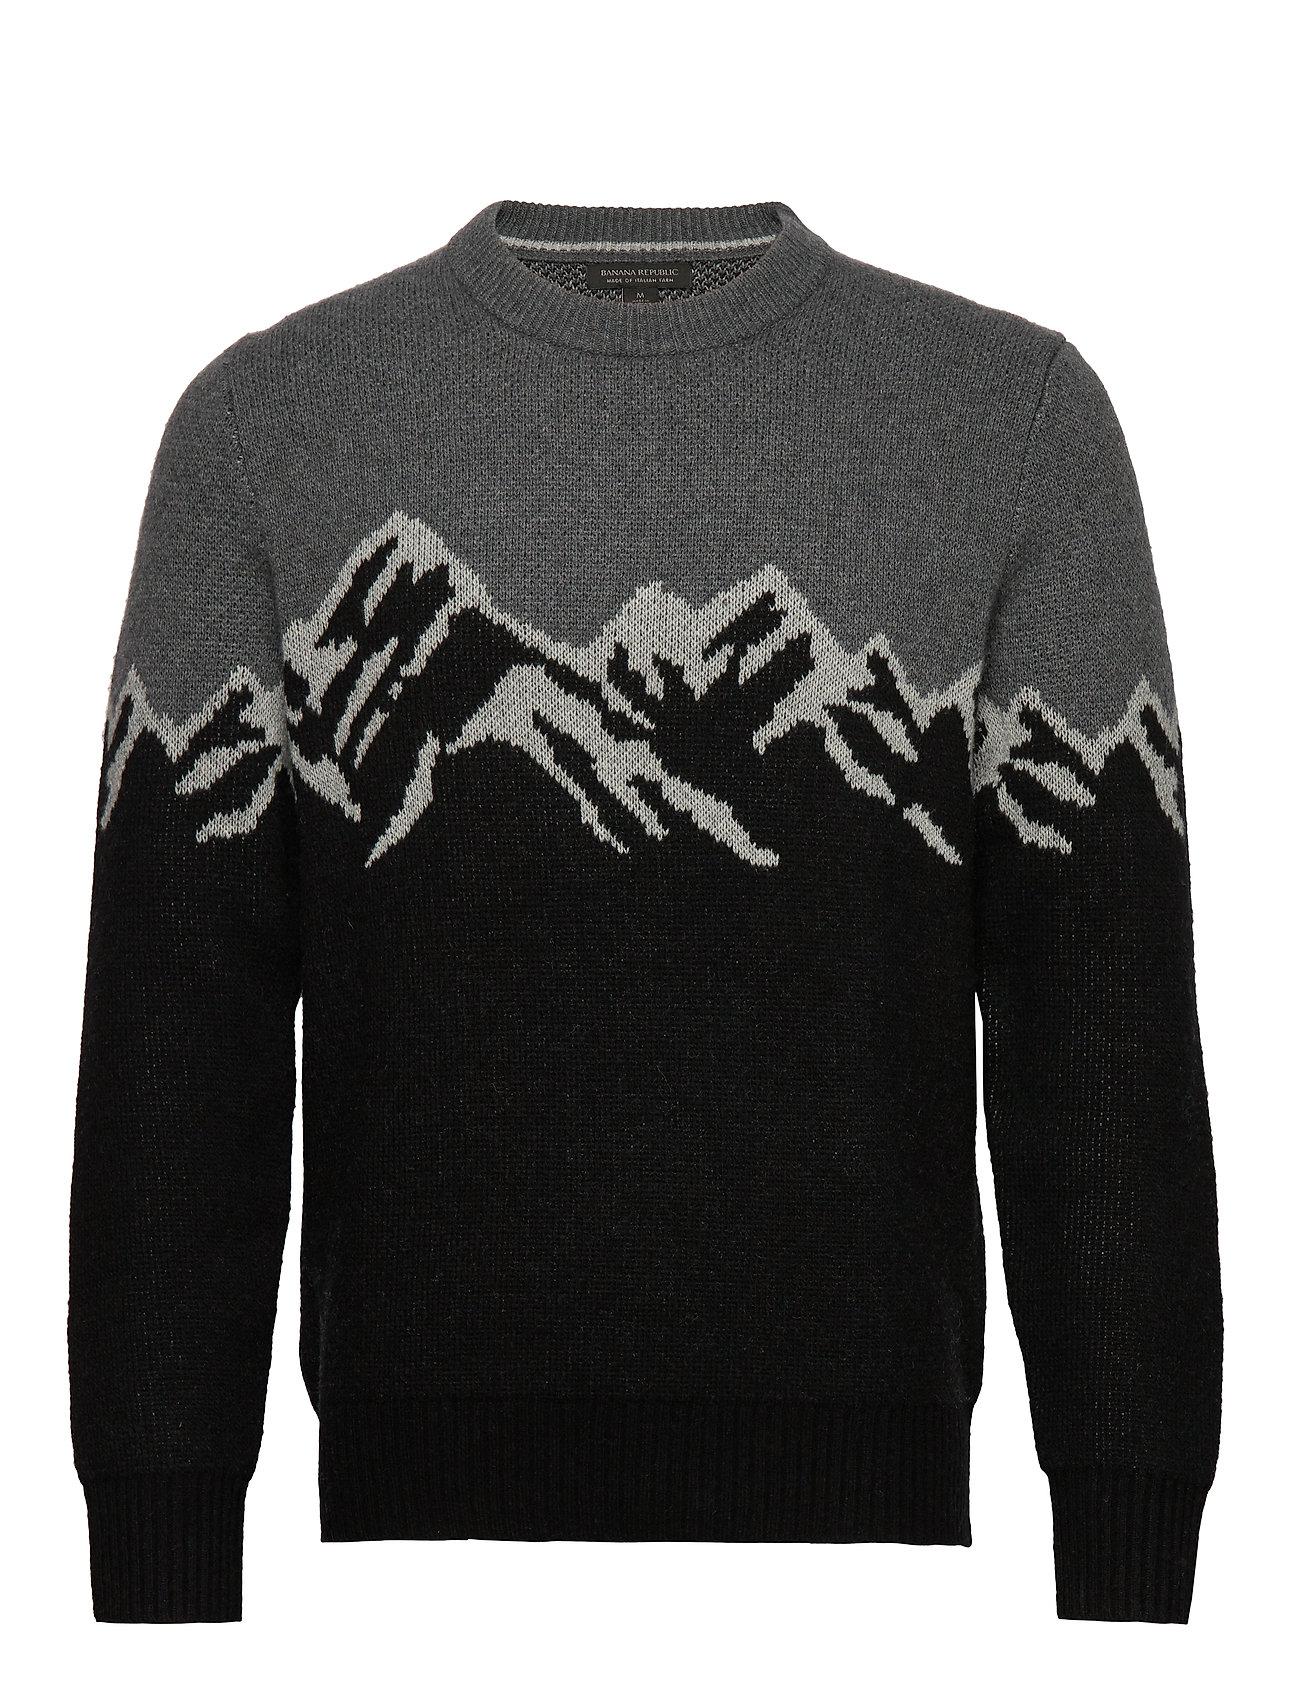 Banana Republic Mountain Graphic Sweater - BLACK